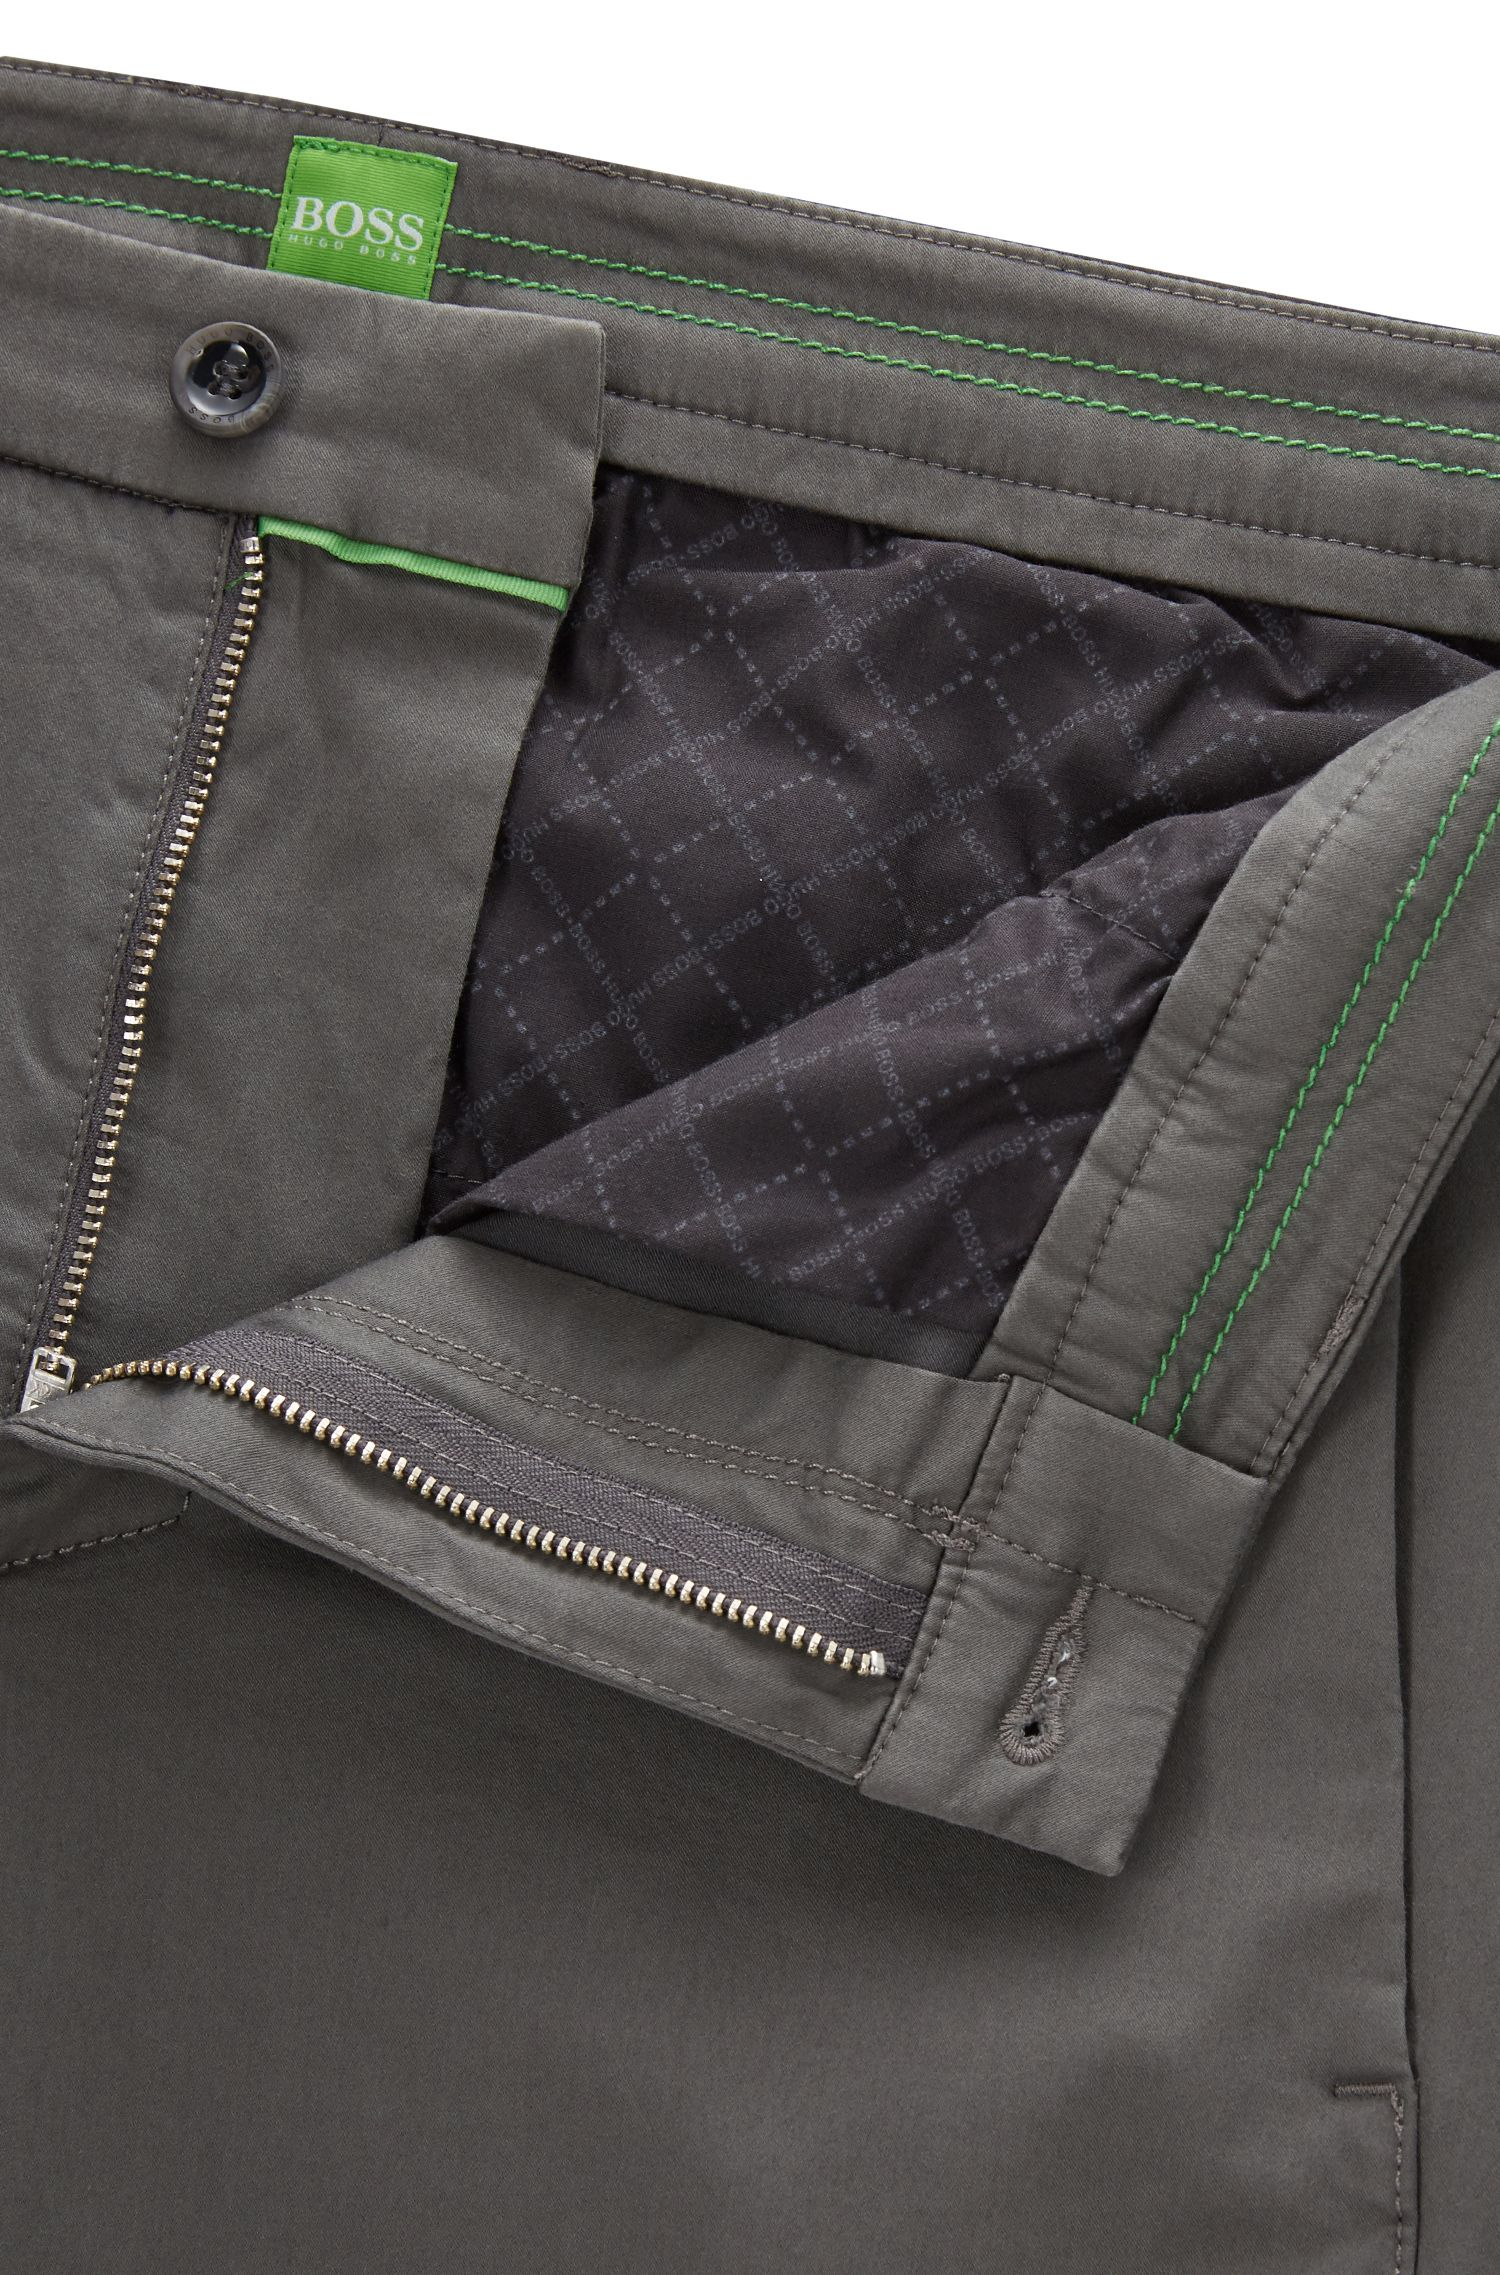 Slim Fit, Stretch Cotton Blend Pants | Leeman W